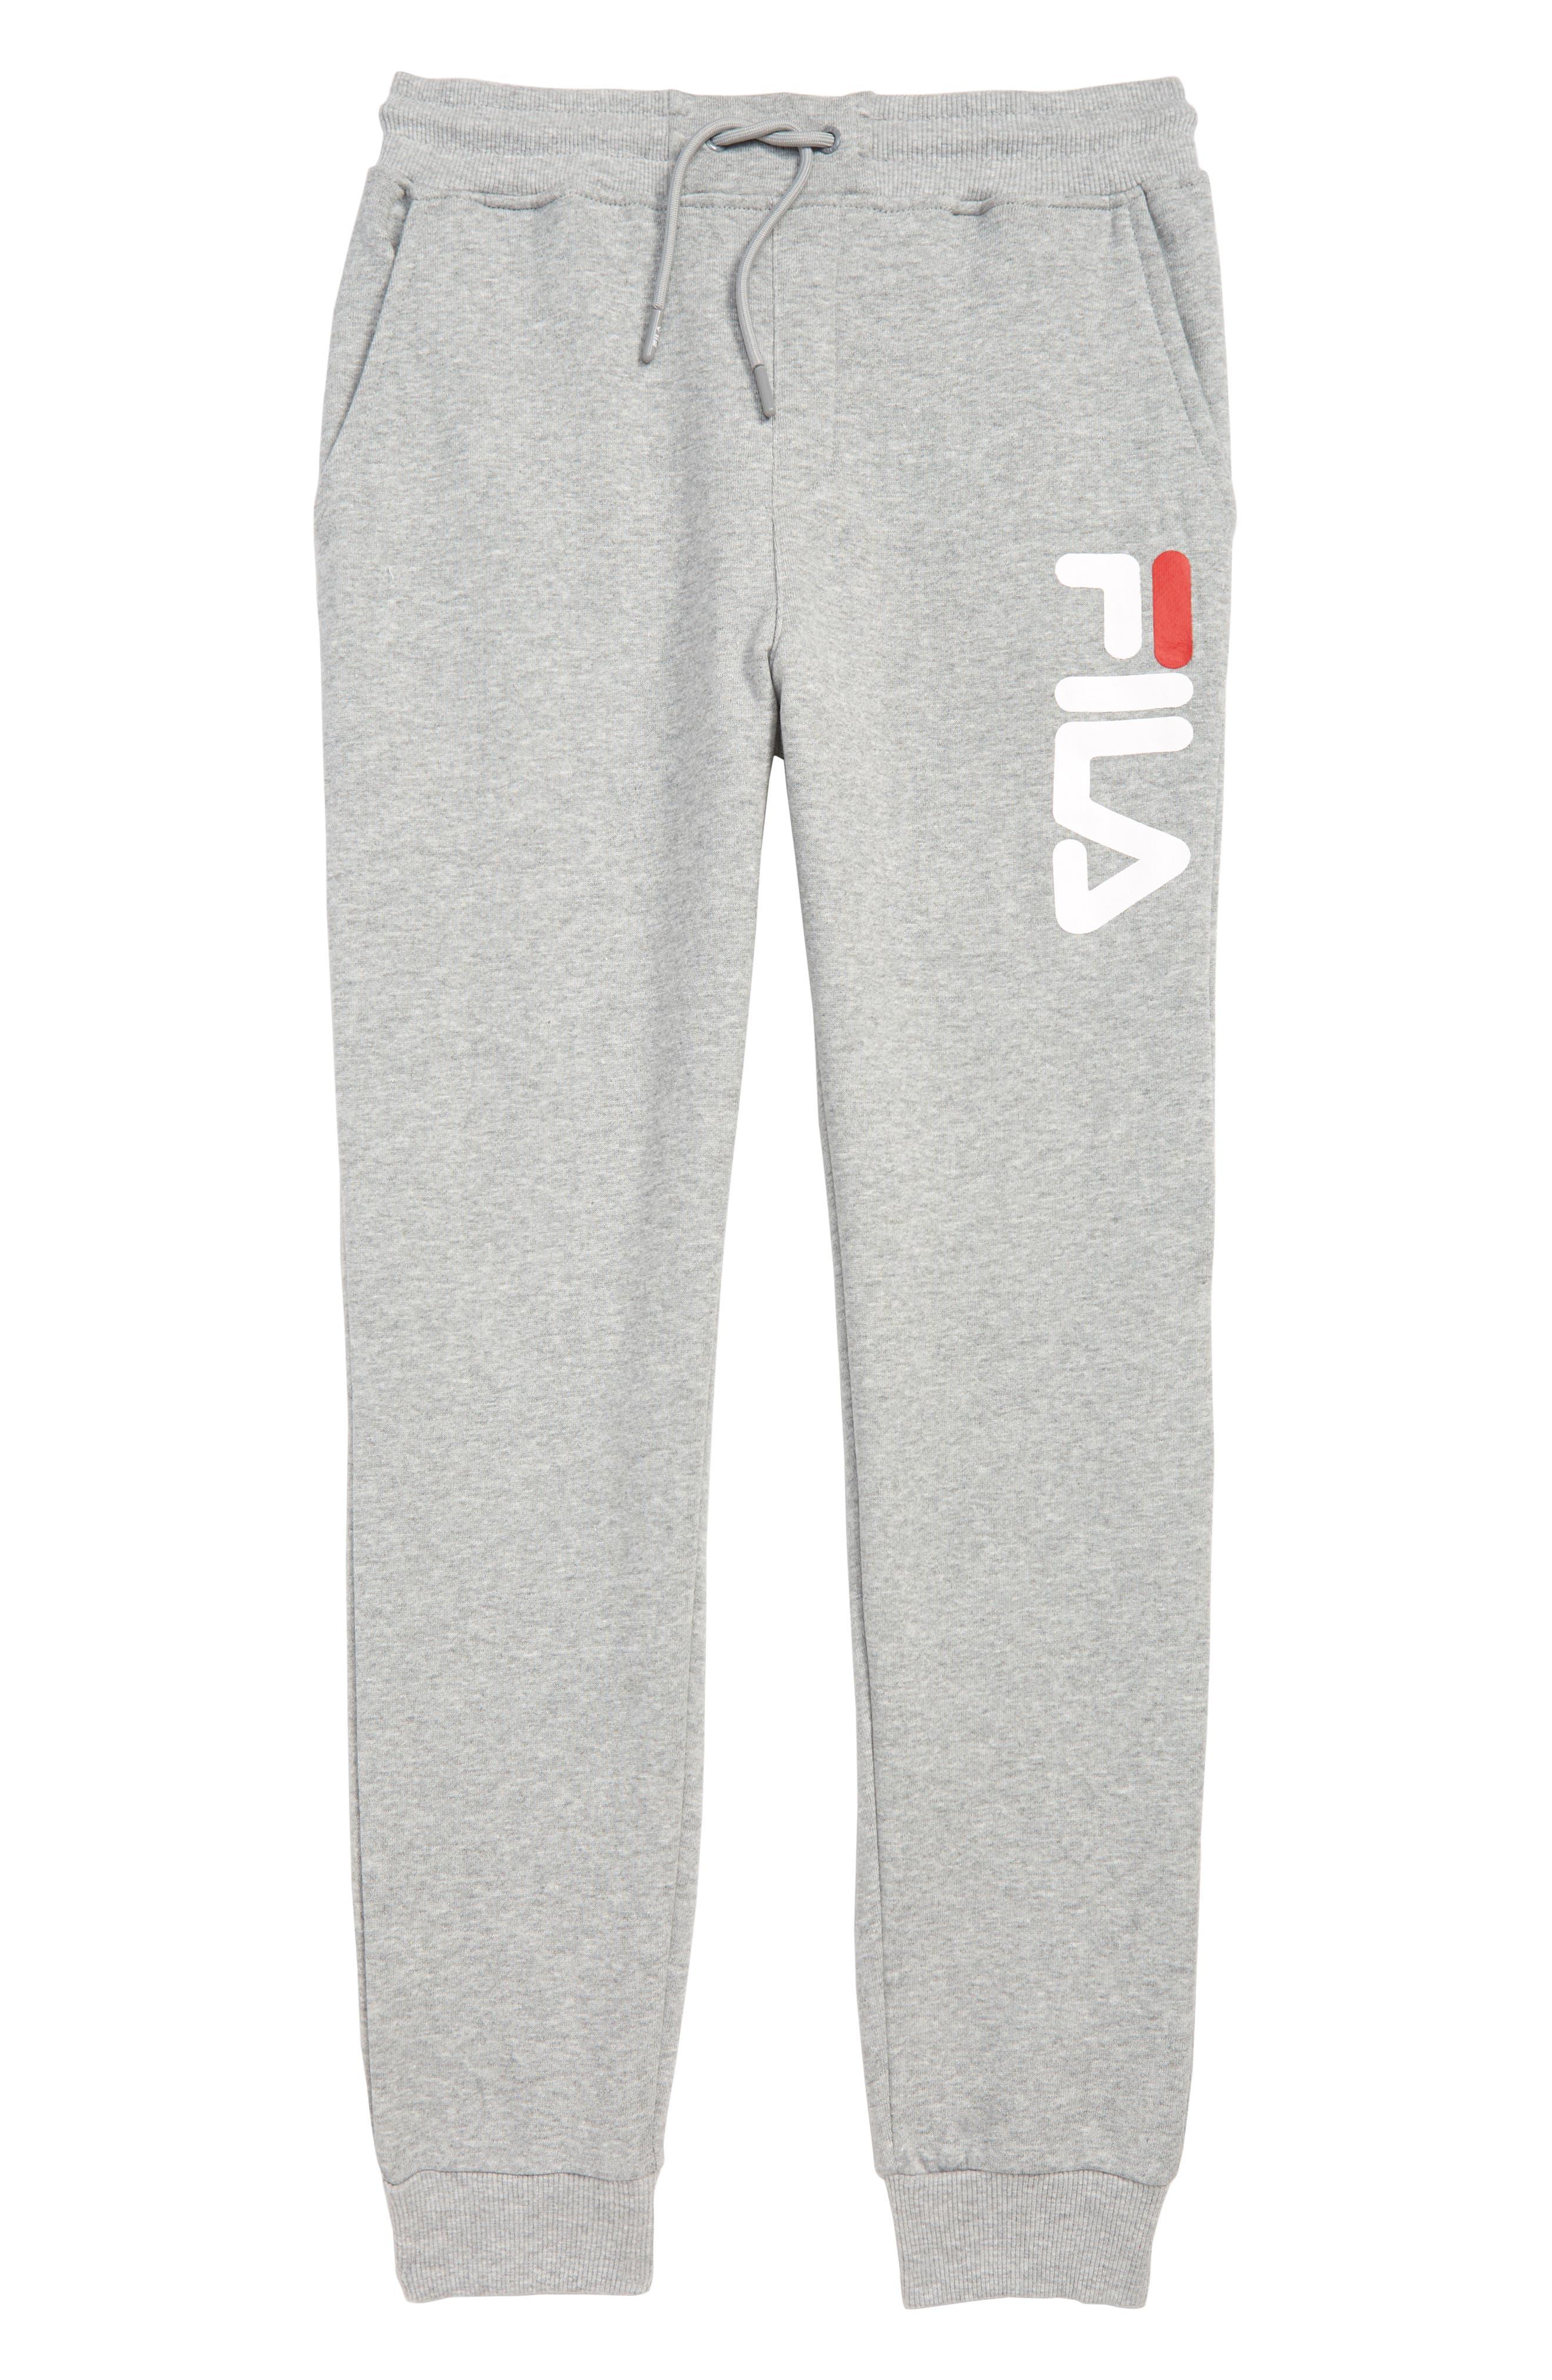 FILA Classic Jogger Pants, Main, color, GREY HEATHER